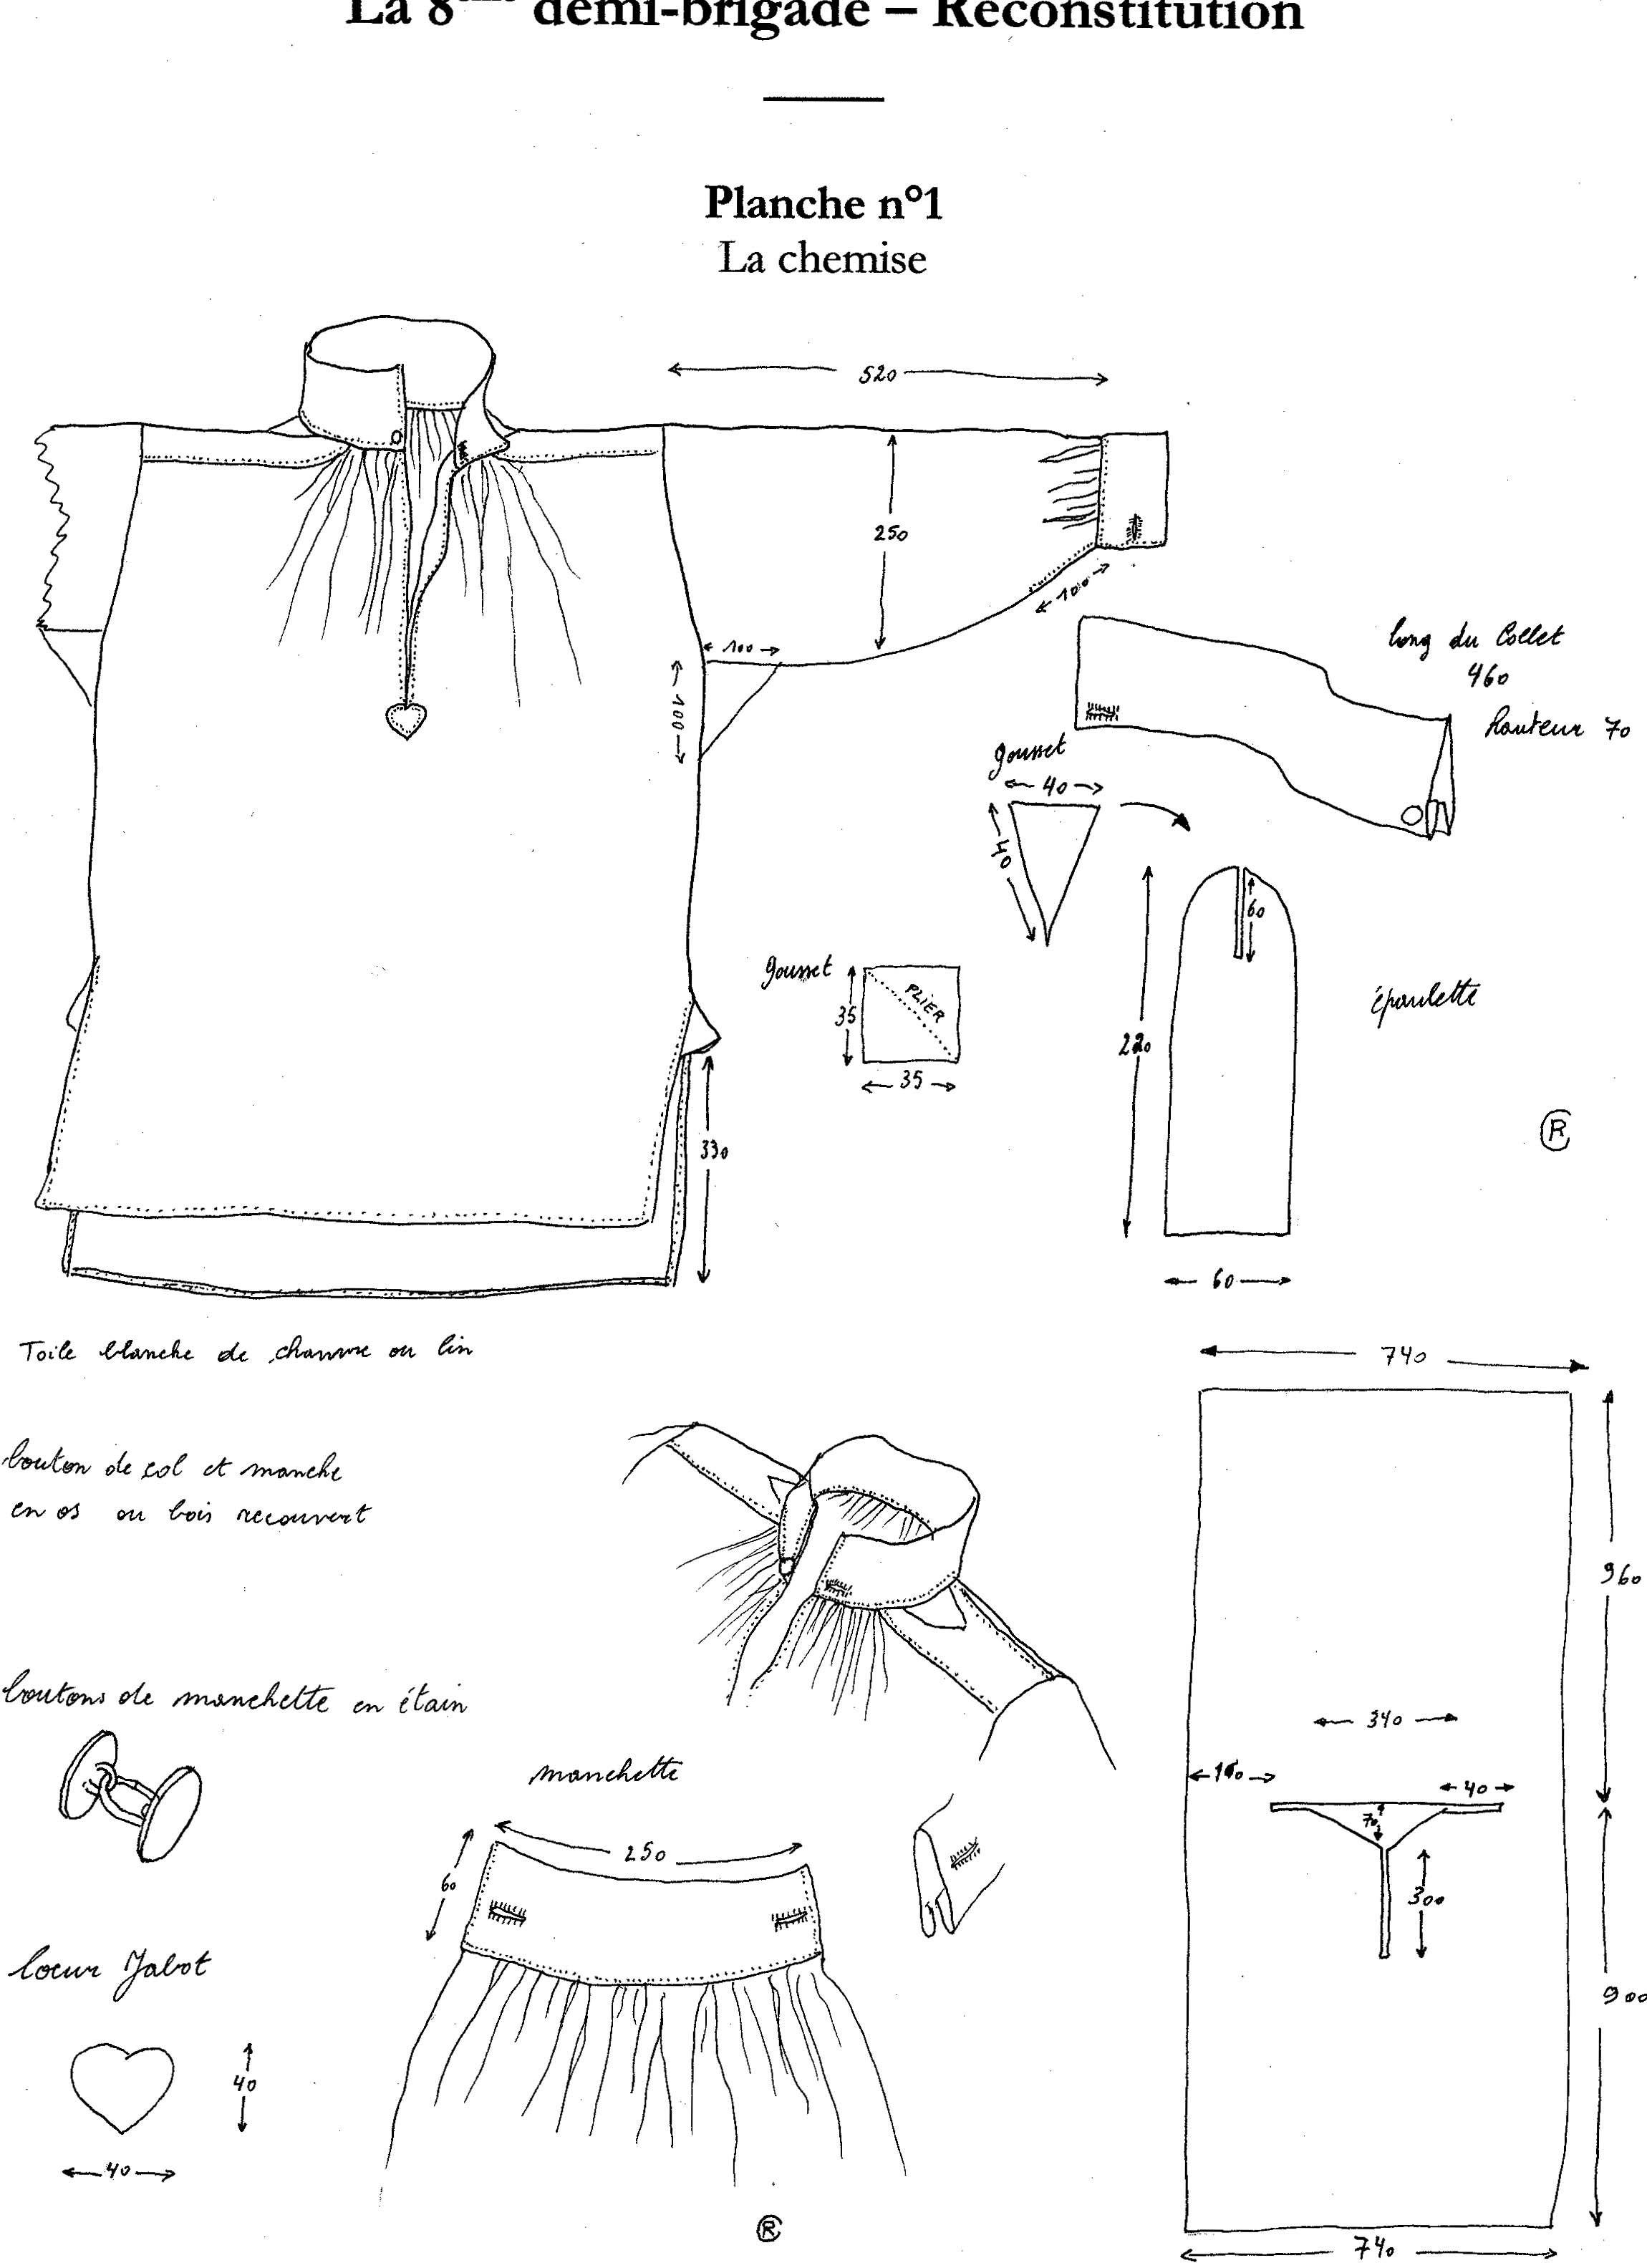 Renaissance Shirt Pattern : renaissance, shirt, pattern, Александра, Napoleonské, Uniformy, Shirt, Pattern,, Historical, Shirts,, Renaissance